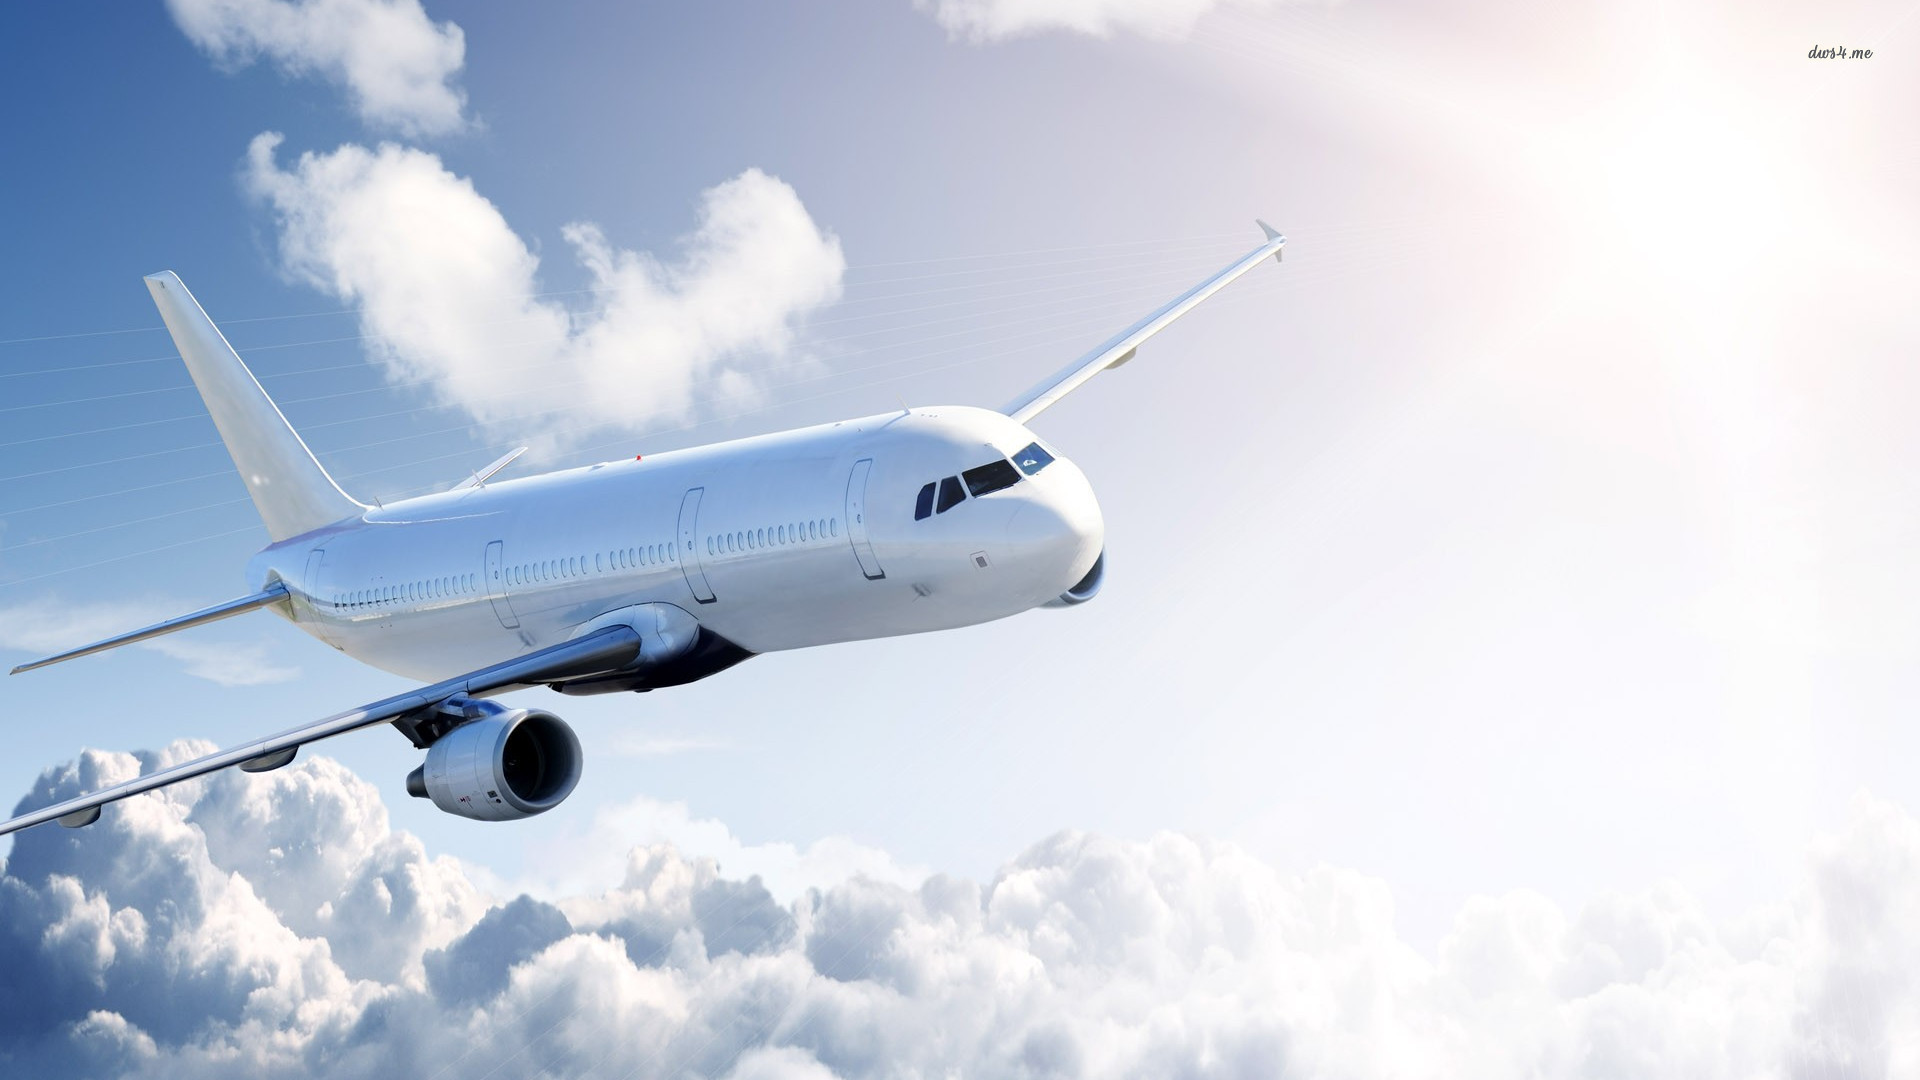 download Passenger Airplanes wallpaper 1920x1080 56338 1920x1080